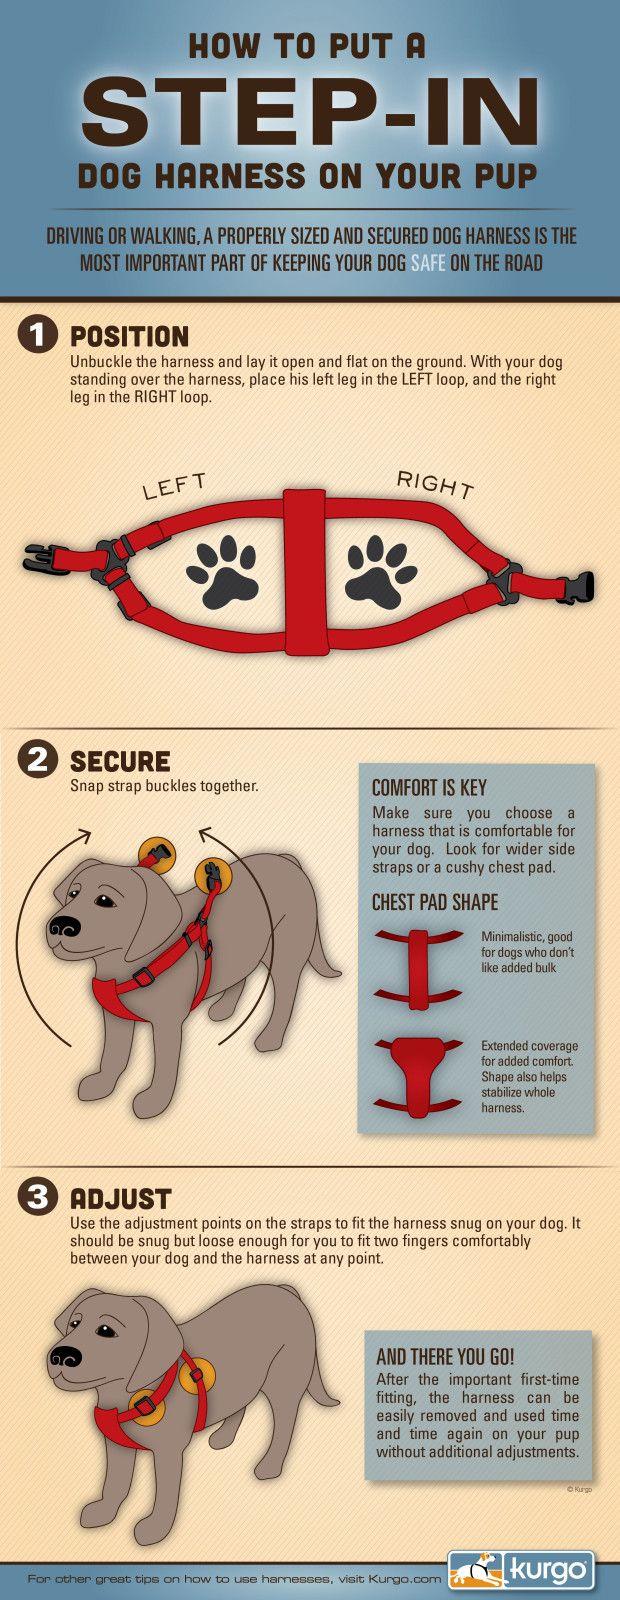 How to Put on a Step-In Dog Harnesshttp://www.kurgoblog.com/put-step-dog-harness/